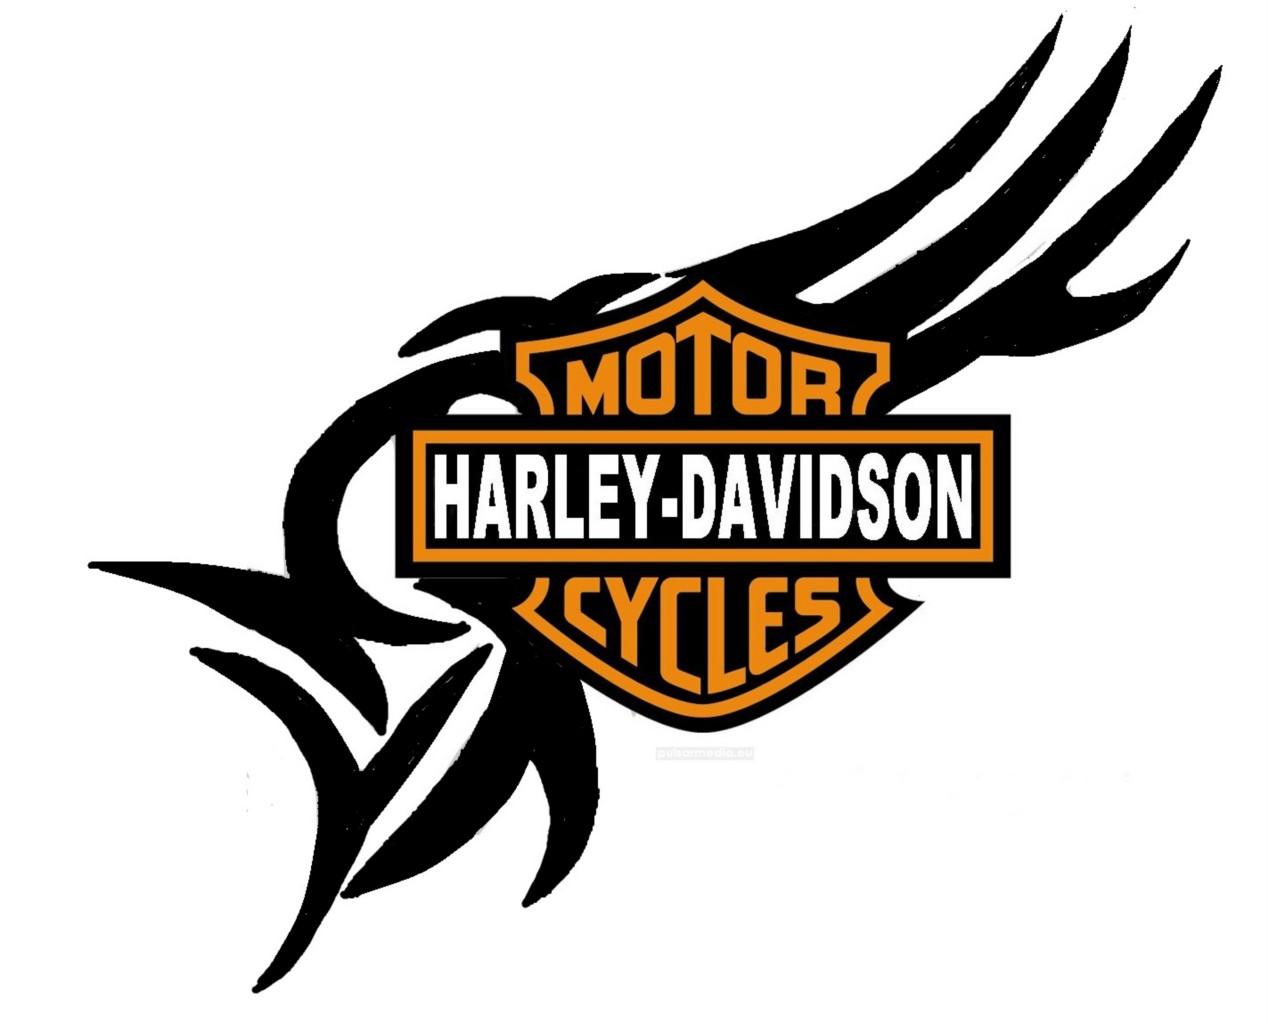 Harley Davidson Logos Free  Clipartsco